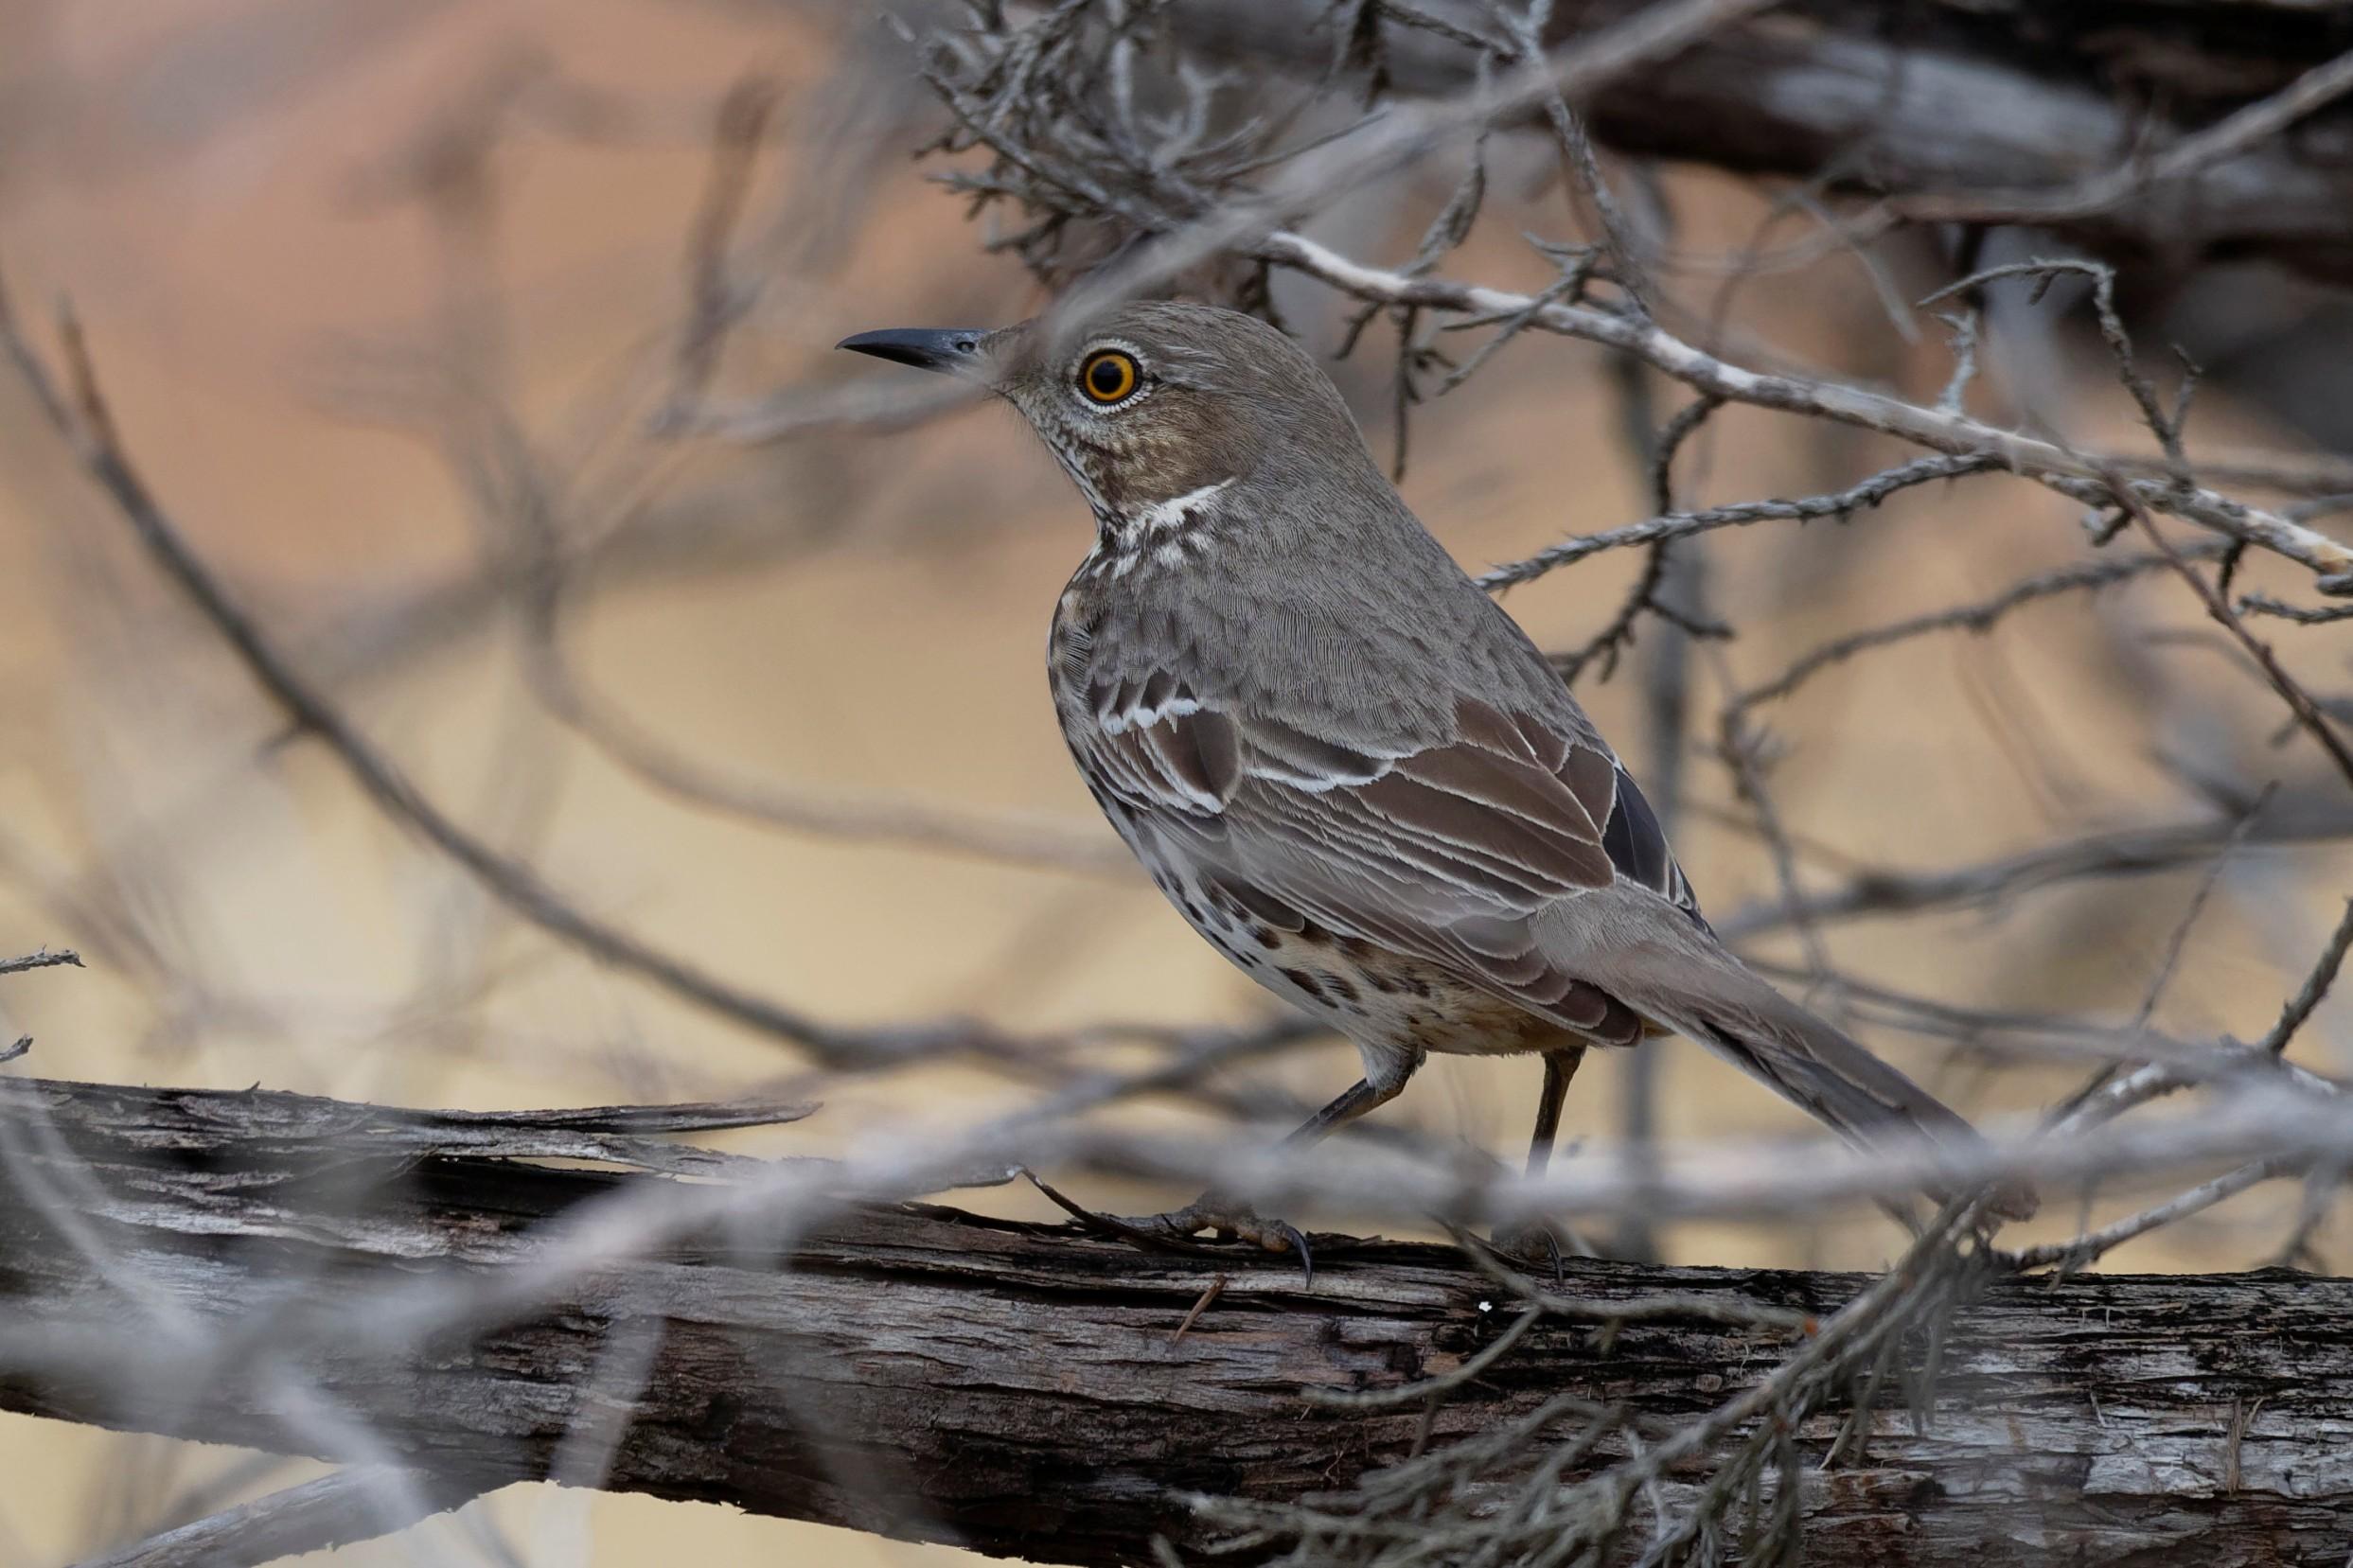 Species: Sage Thrasher Photo Credit: Dina Perry Date: November 2018 Location: Honey Creek SNA